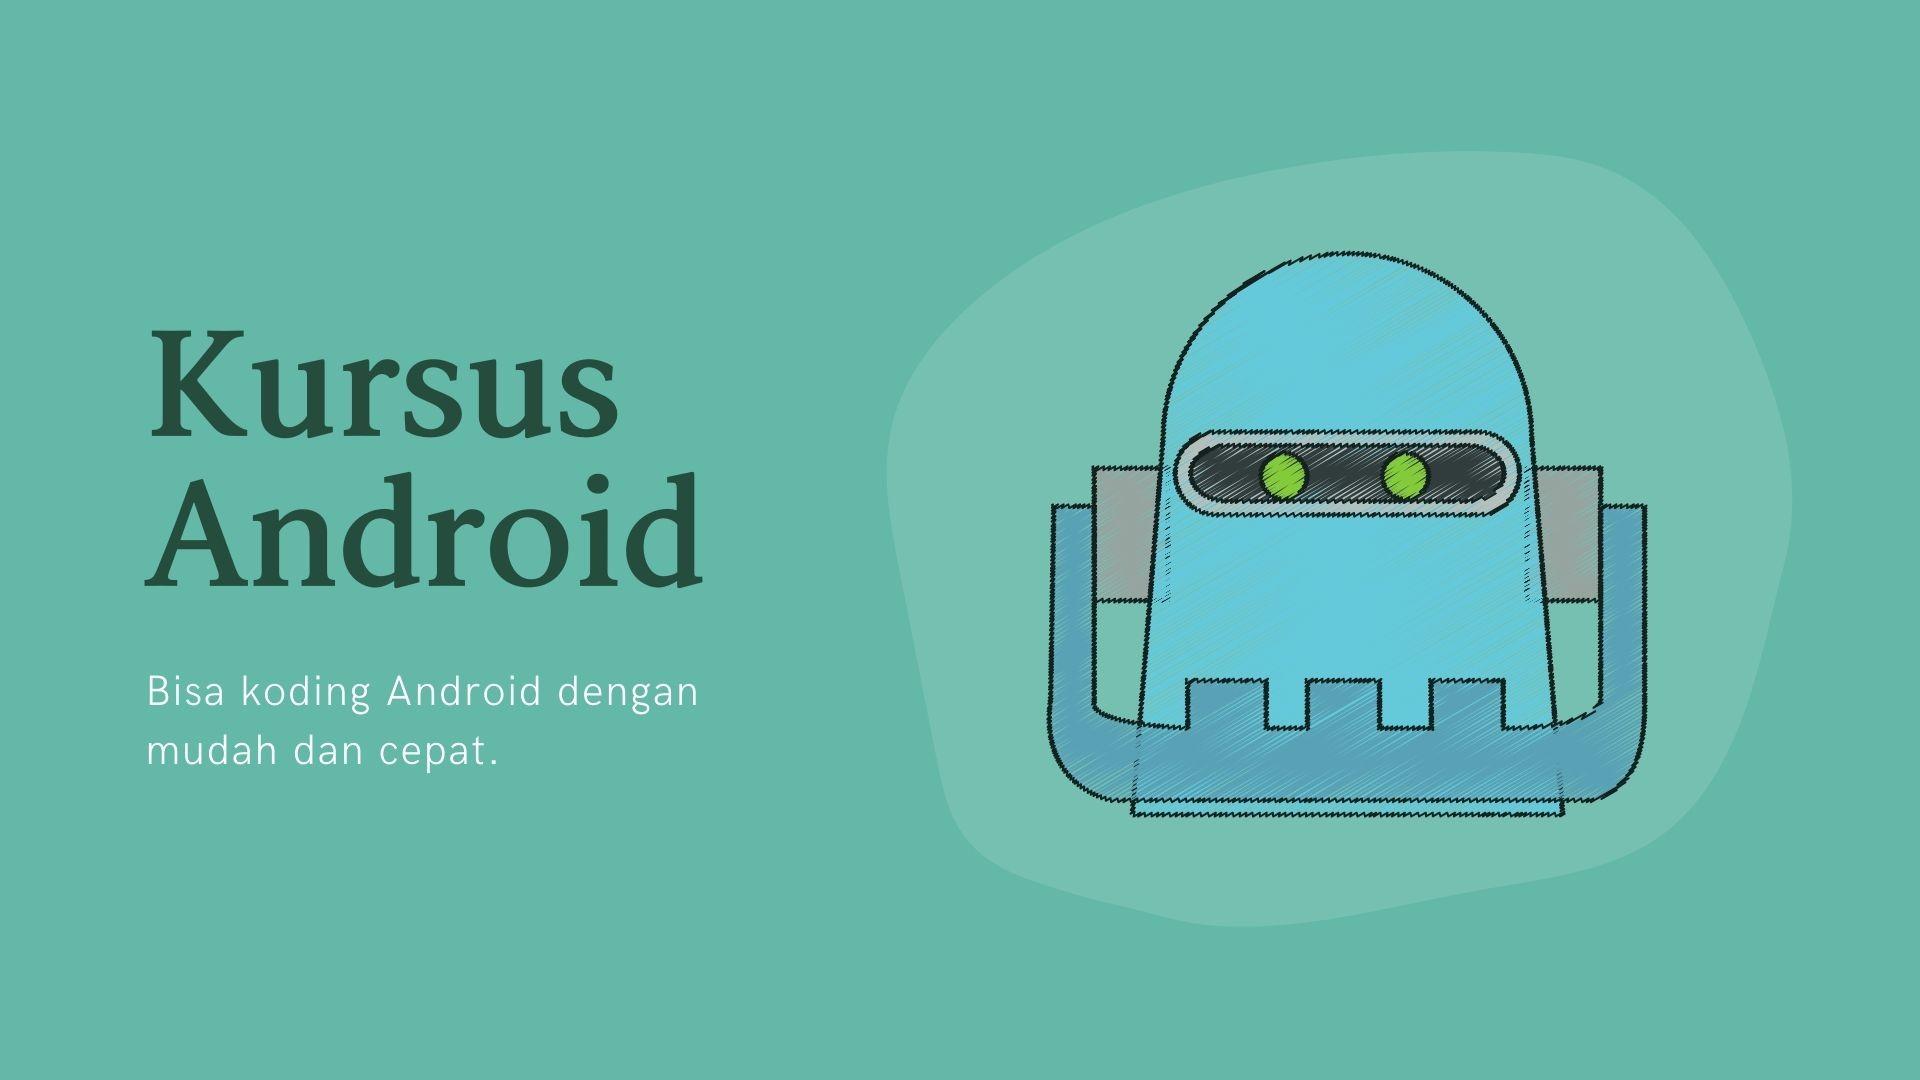 kursus android